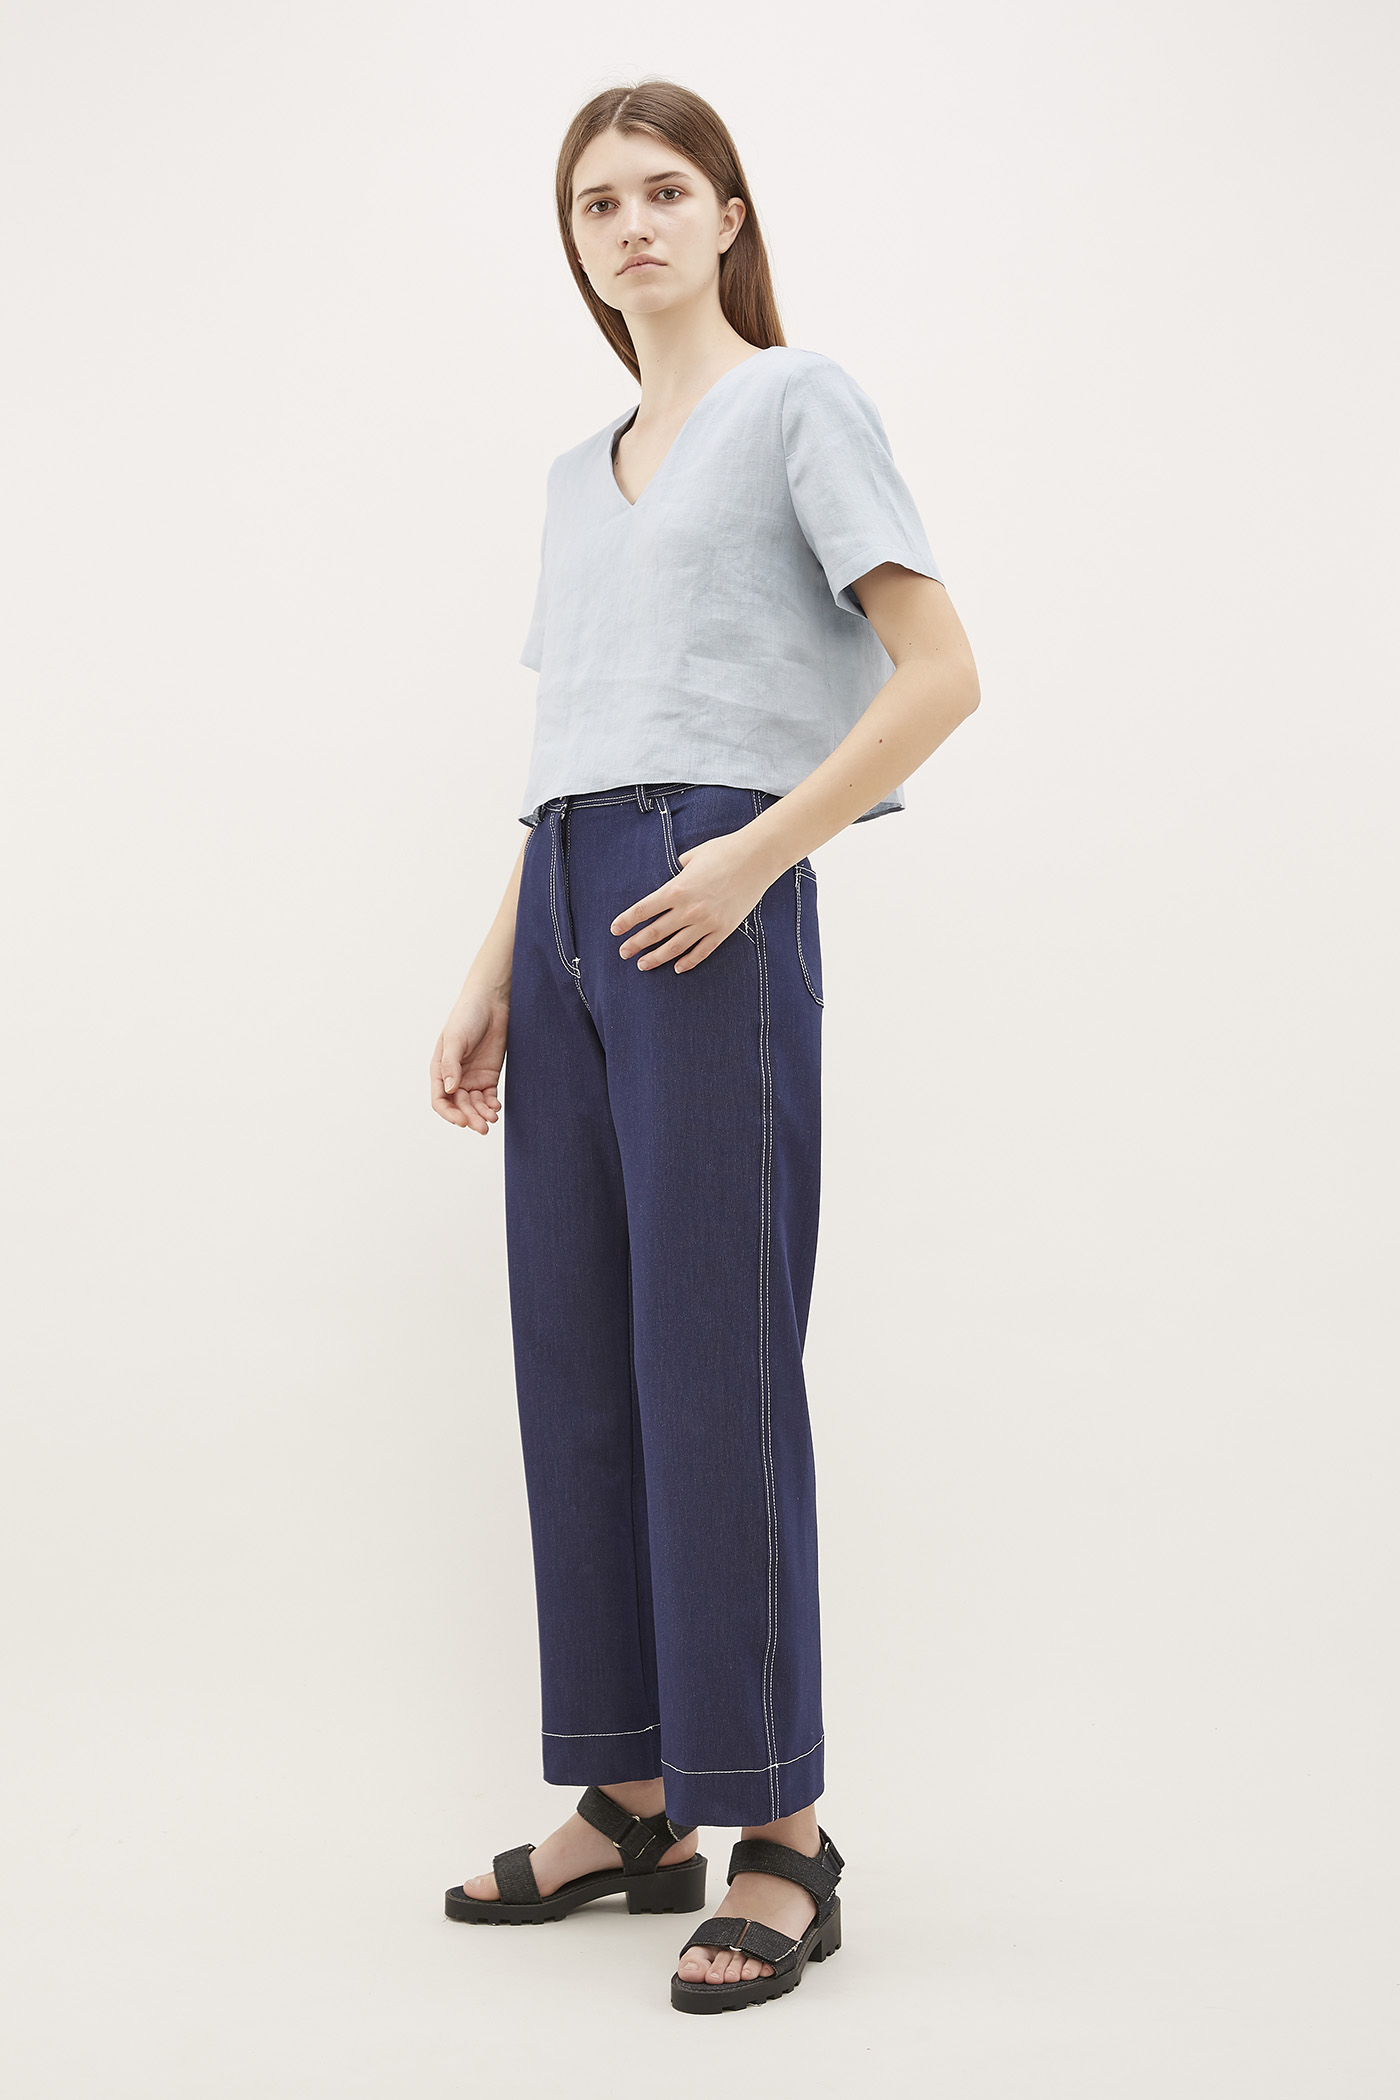 Qays Cross-Back Linen Top